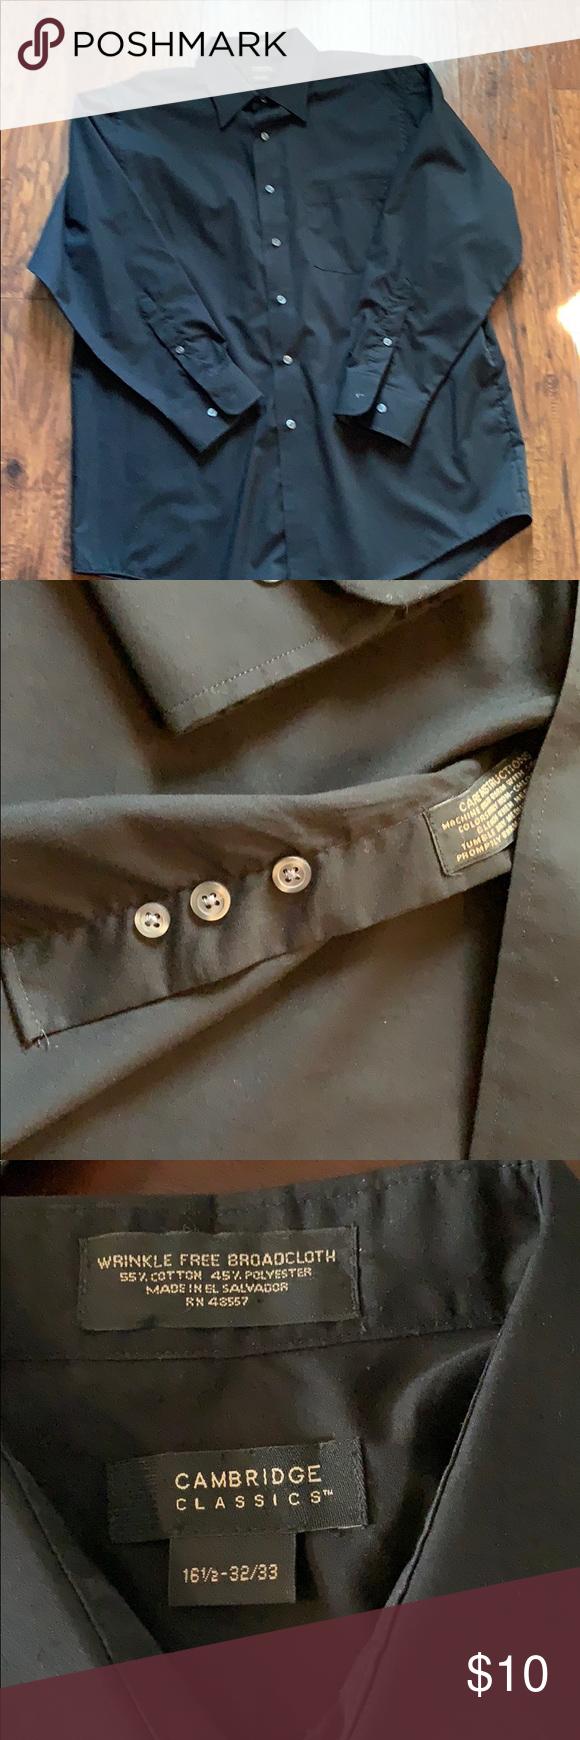 Men S Black Dress Shirt Black Dress Shirt Men Black Shirt Dress Shirts [ 1740 x 580 Pixel ]